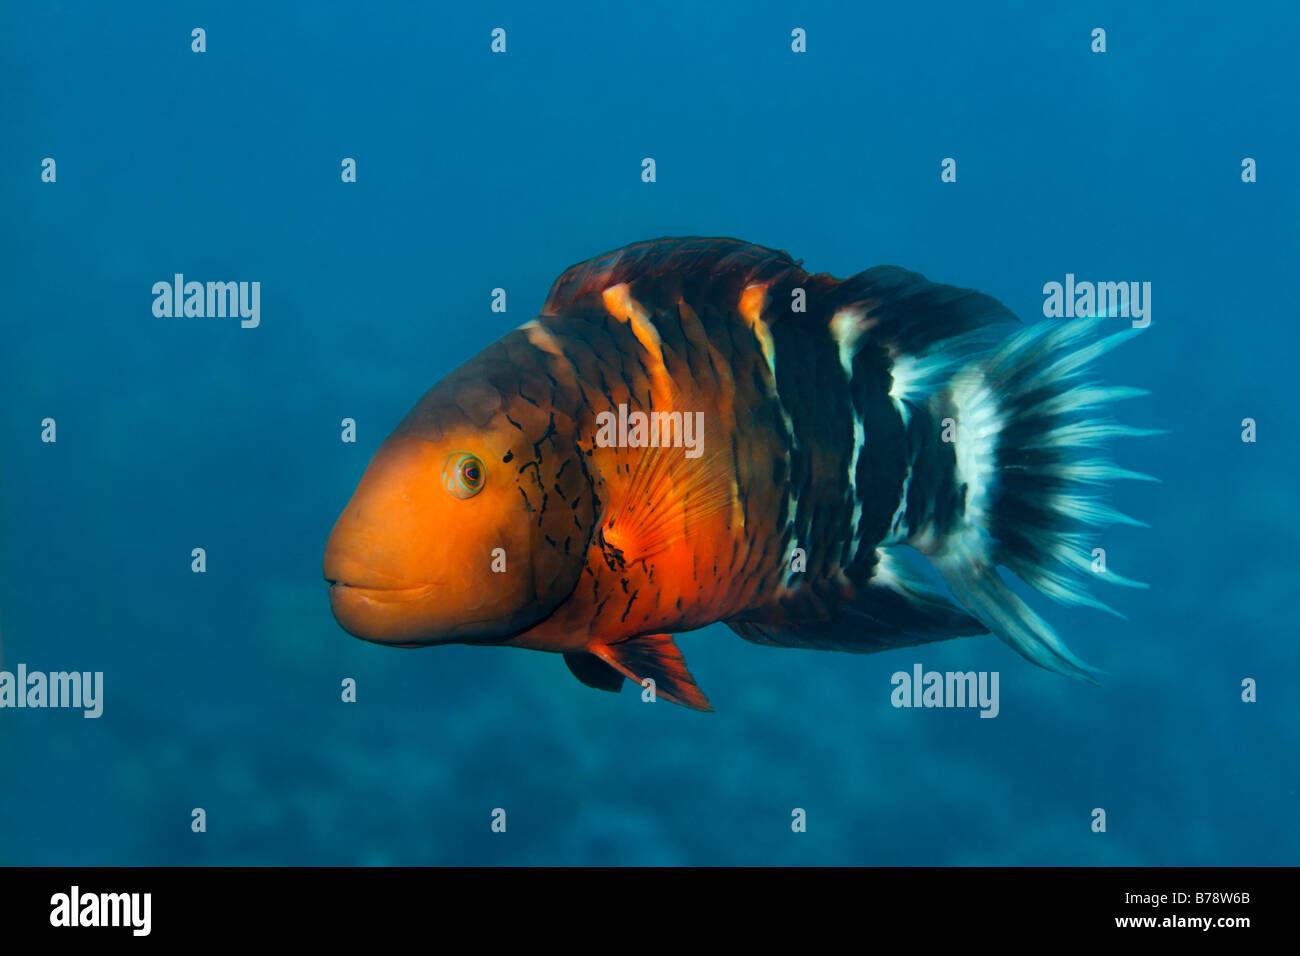 Red-Breasted Lippfisch (Cheilinus Fasciatus), Hurghada, Rotes Meer, Ägypten, Afrika Stockbild